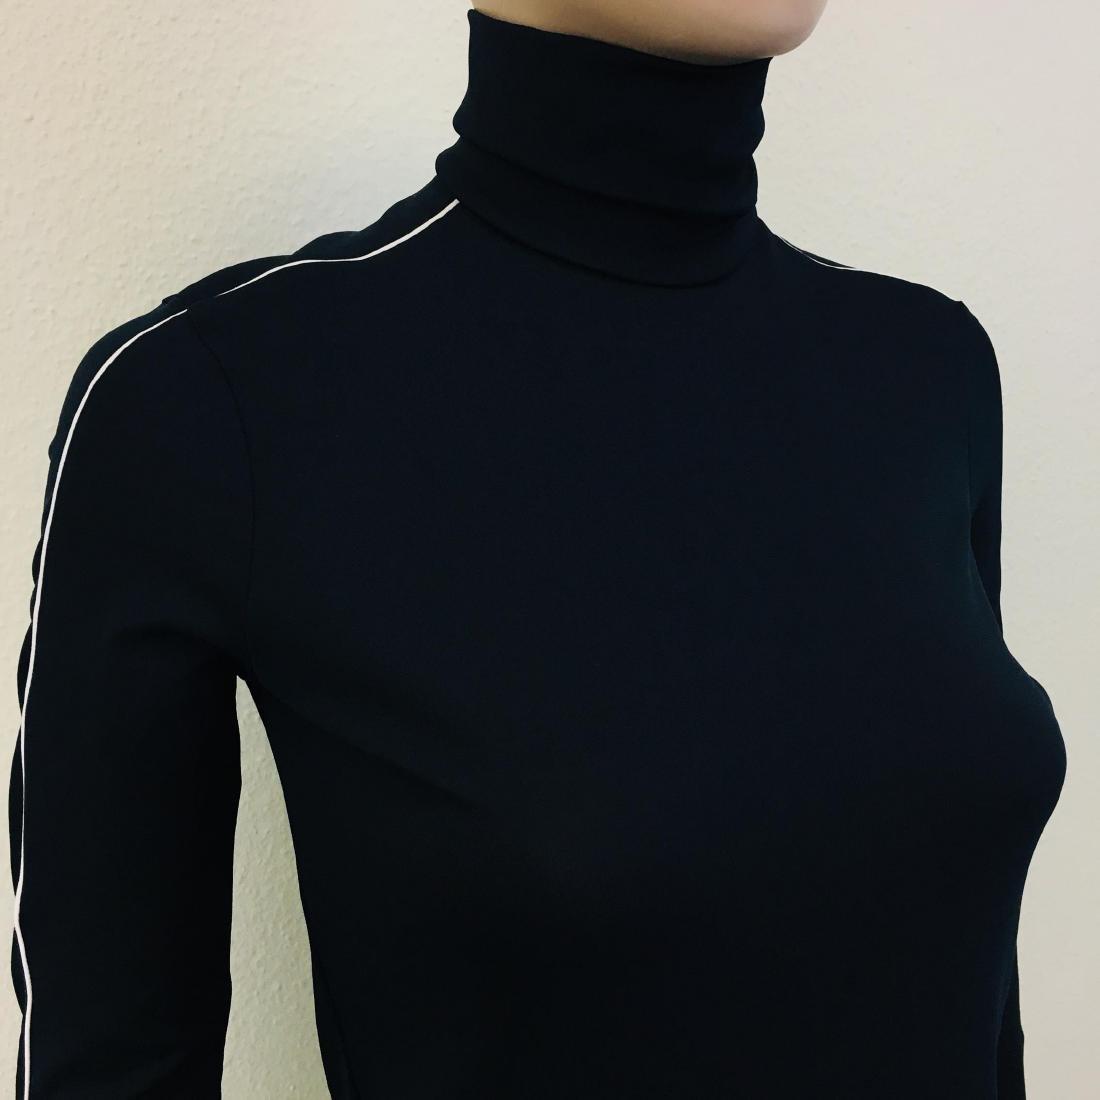 New Women's ZARA Turtleneck Sweater Size M - 5